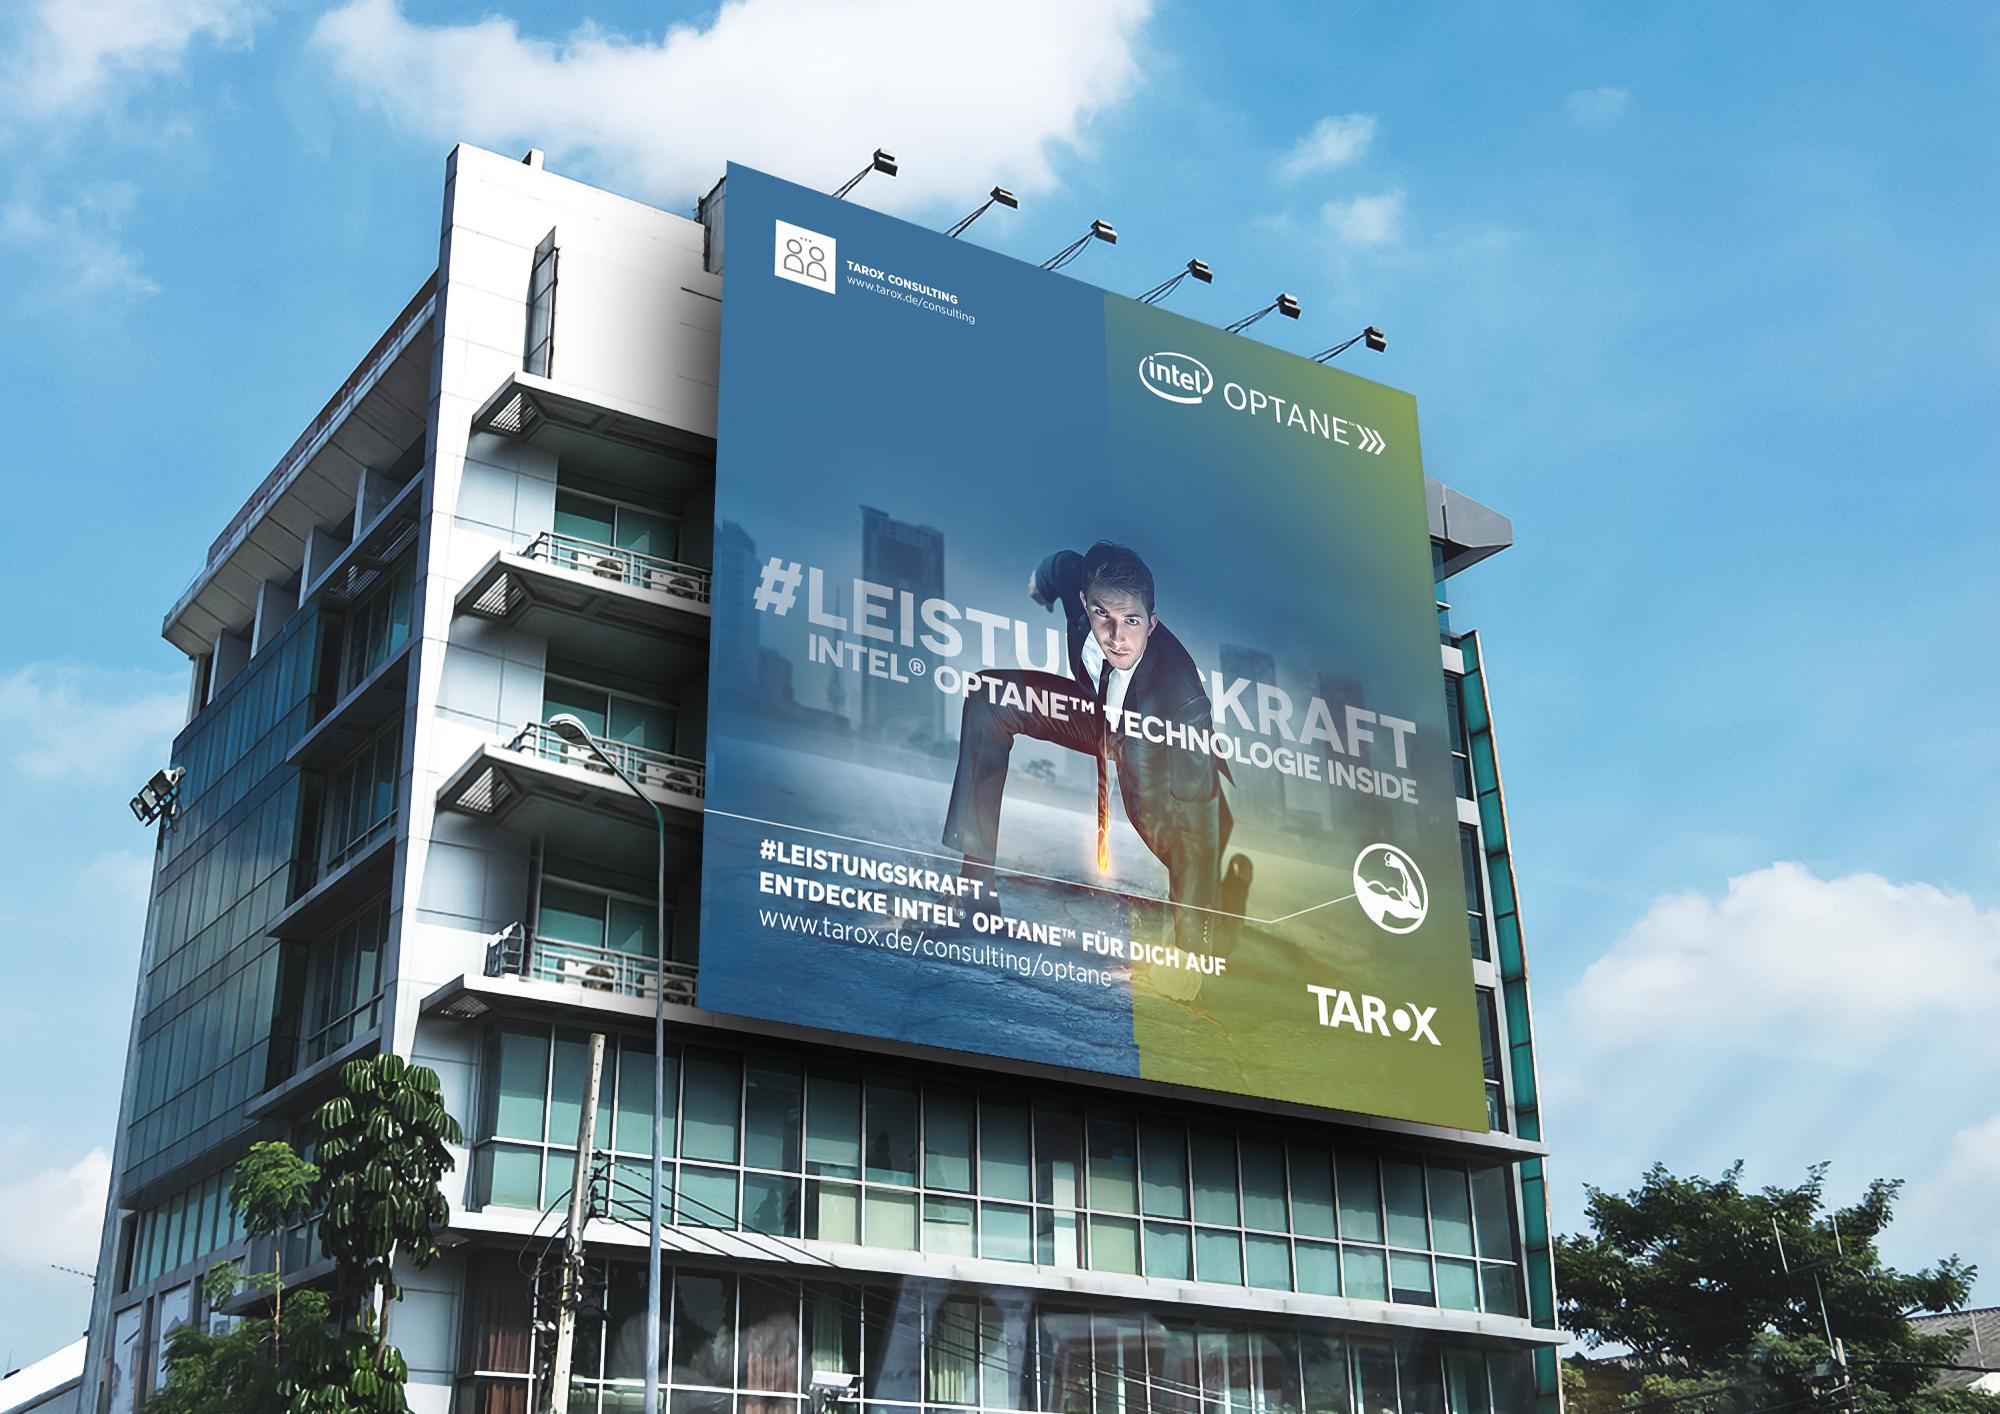 Intel Optane Kampagne / Vertrieb TAROX